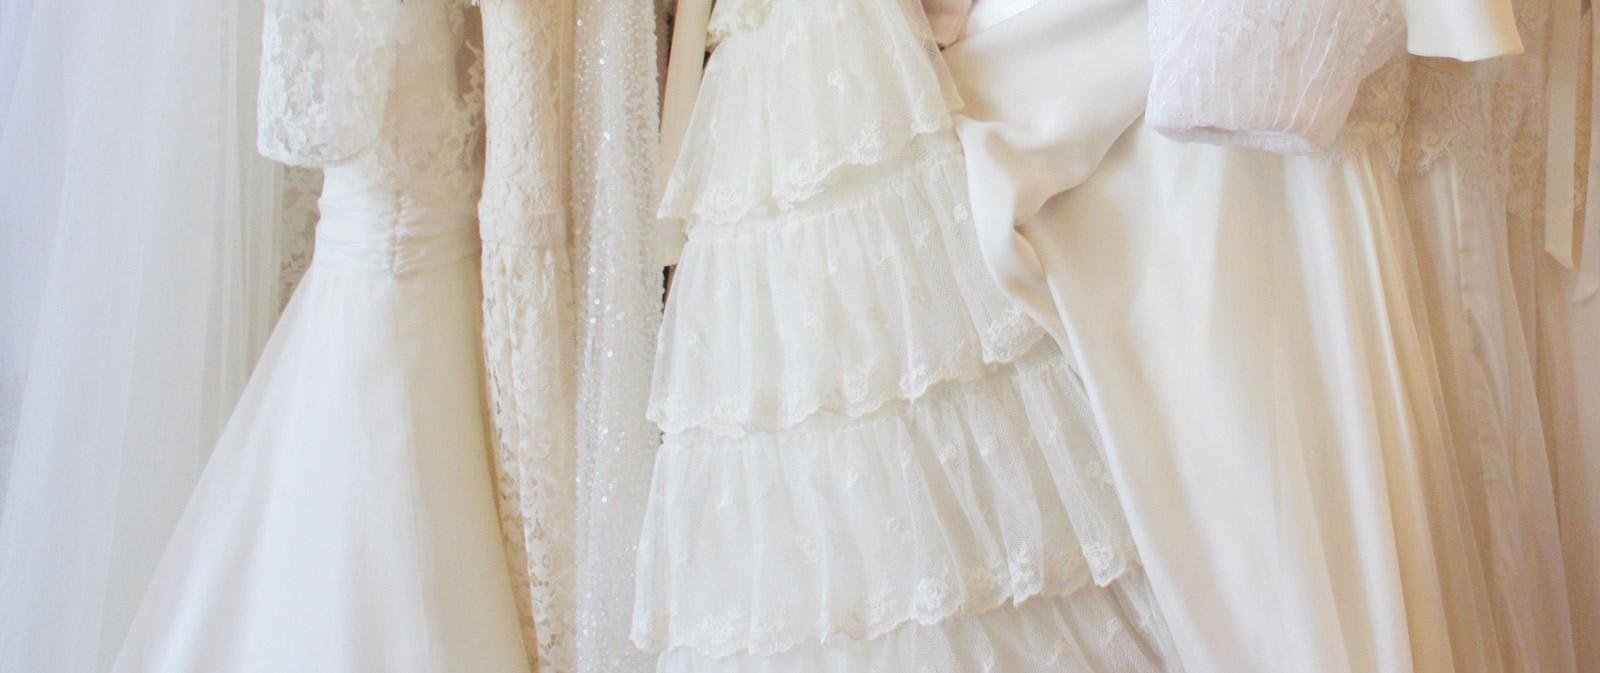 photos-robe-mariage-les-tetes-chercheuses